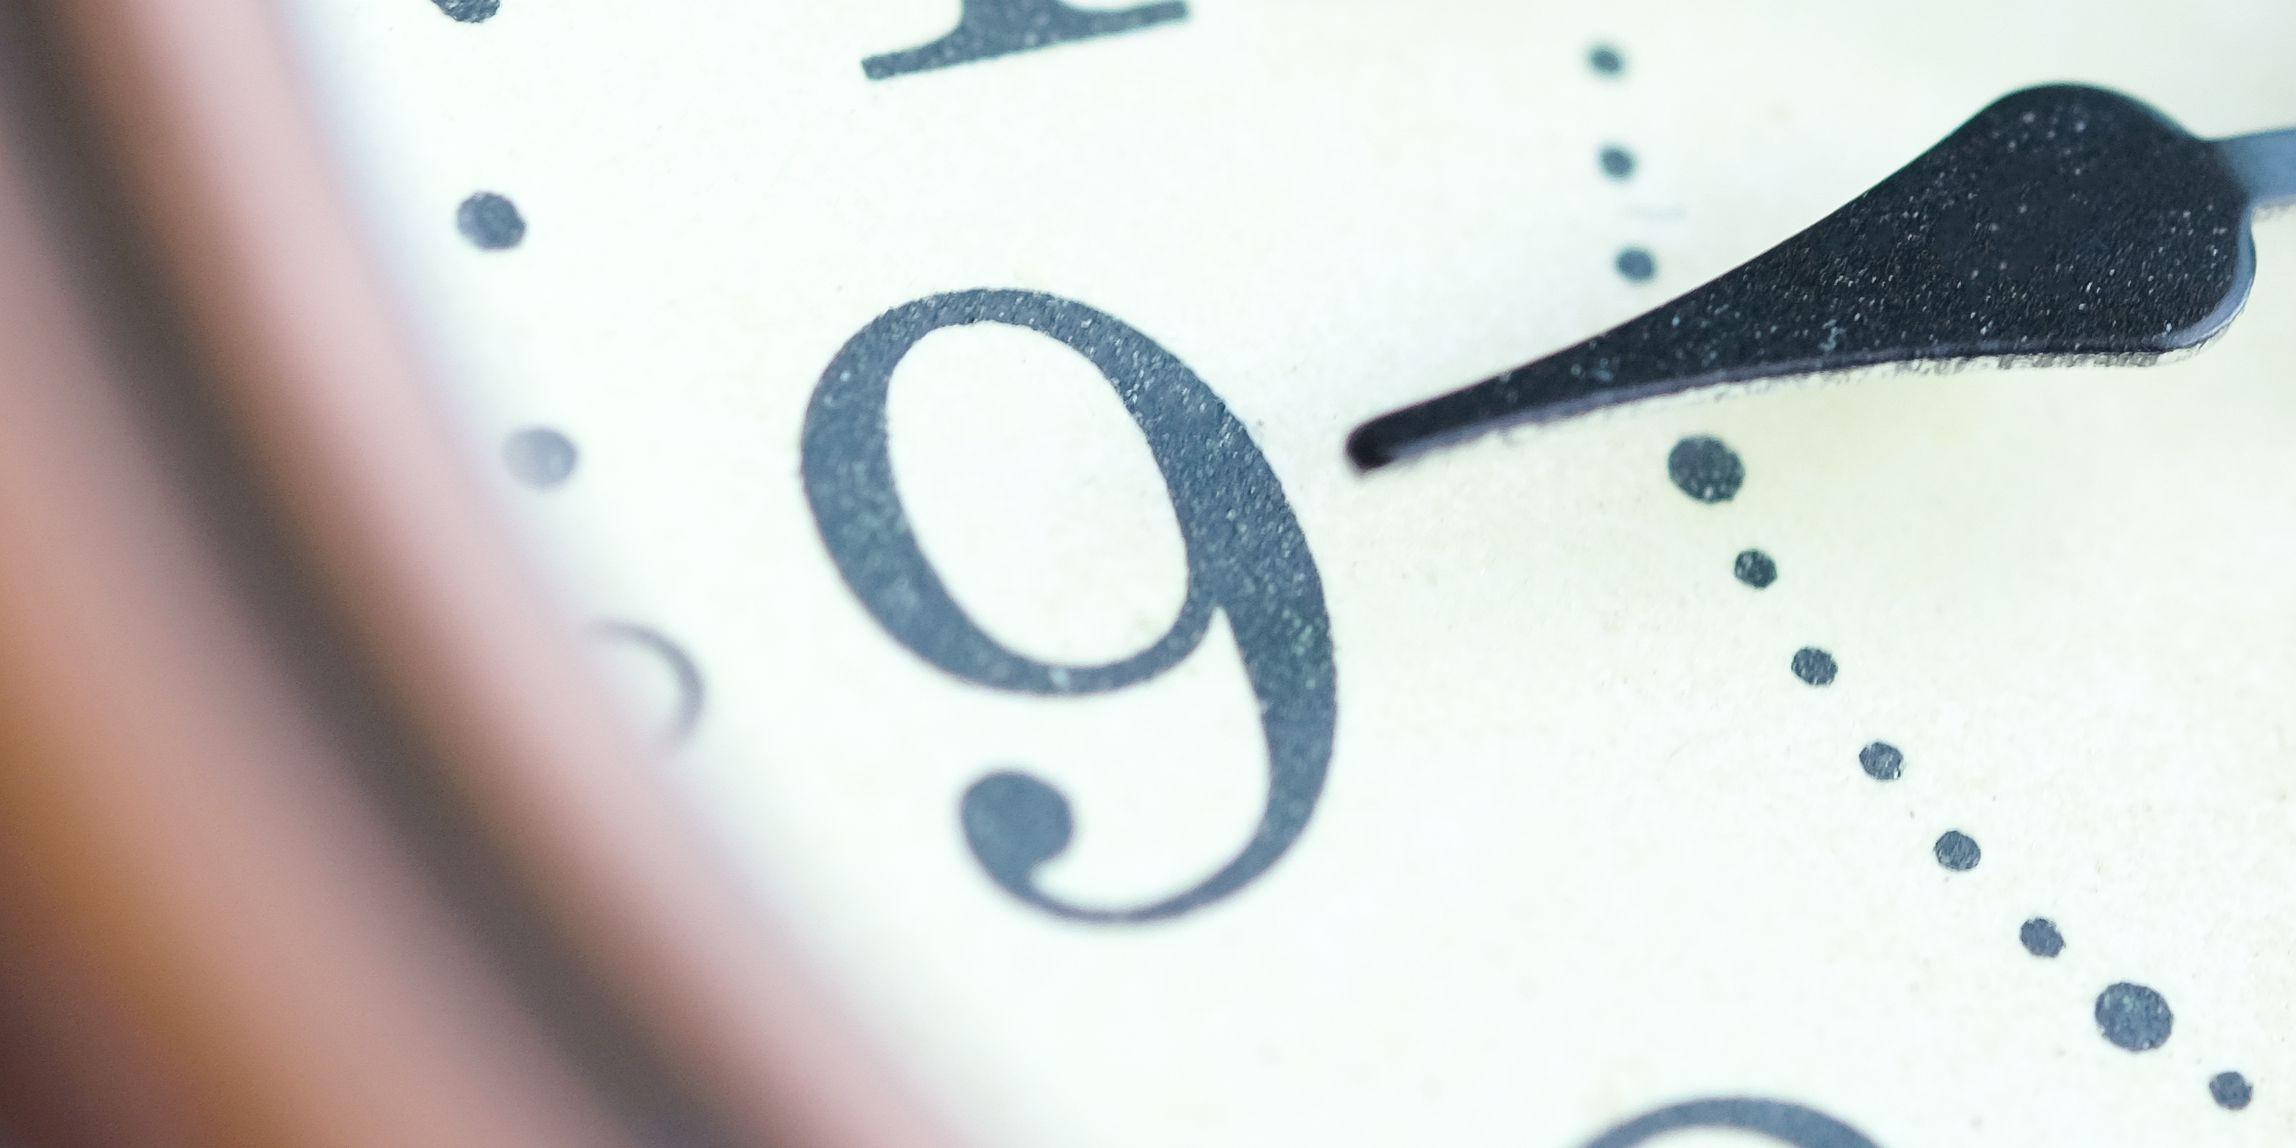 Spring forward! Daylight saving time starts Sunday